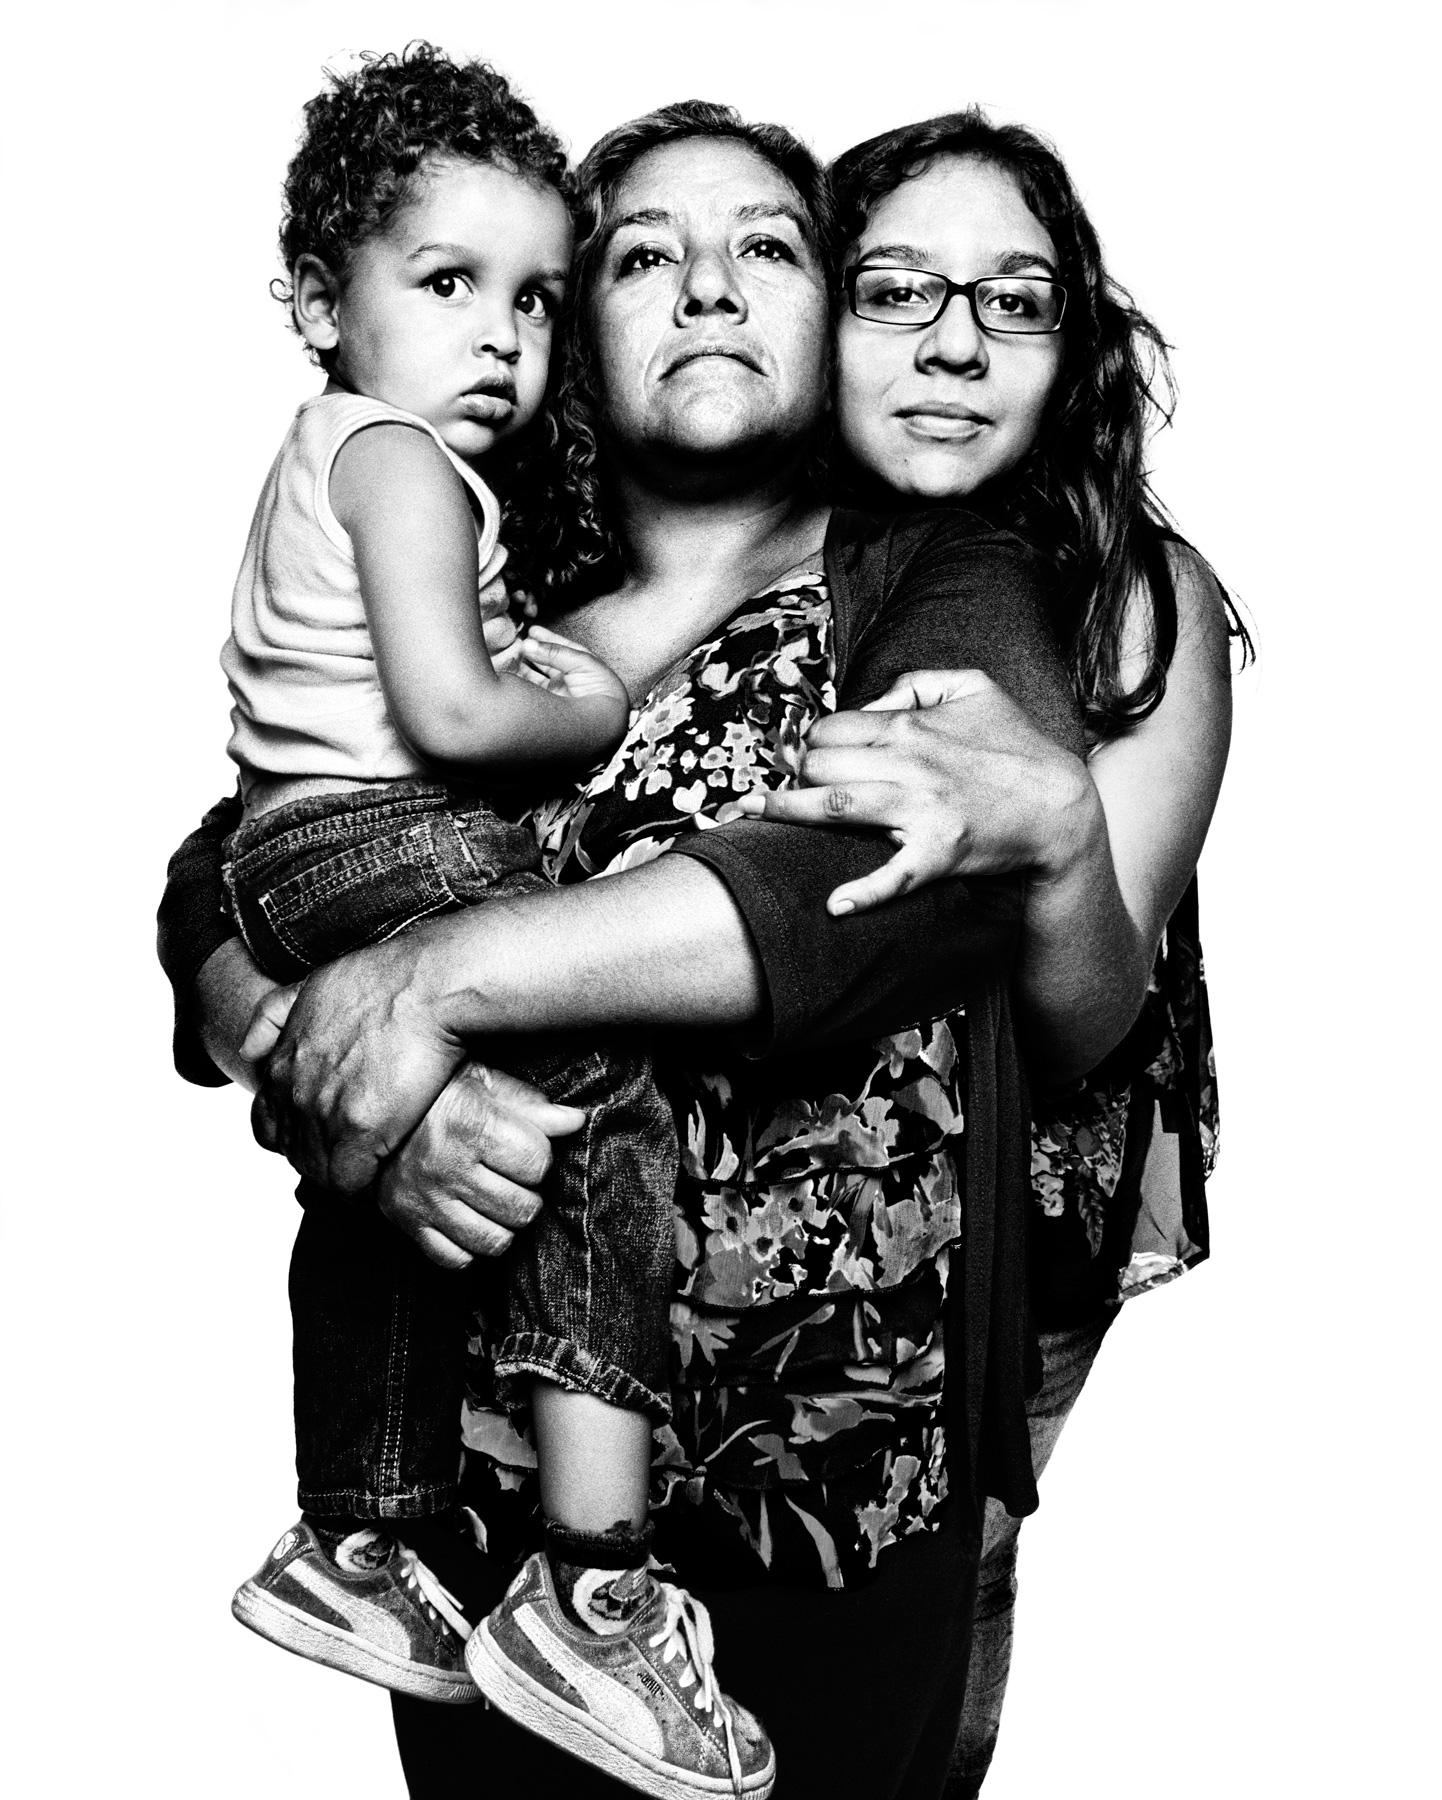 Melida Ruiz, 52 | New York City | June 14, 2013